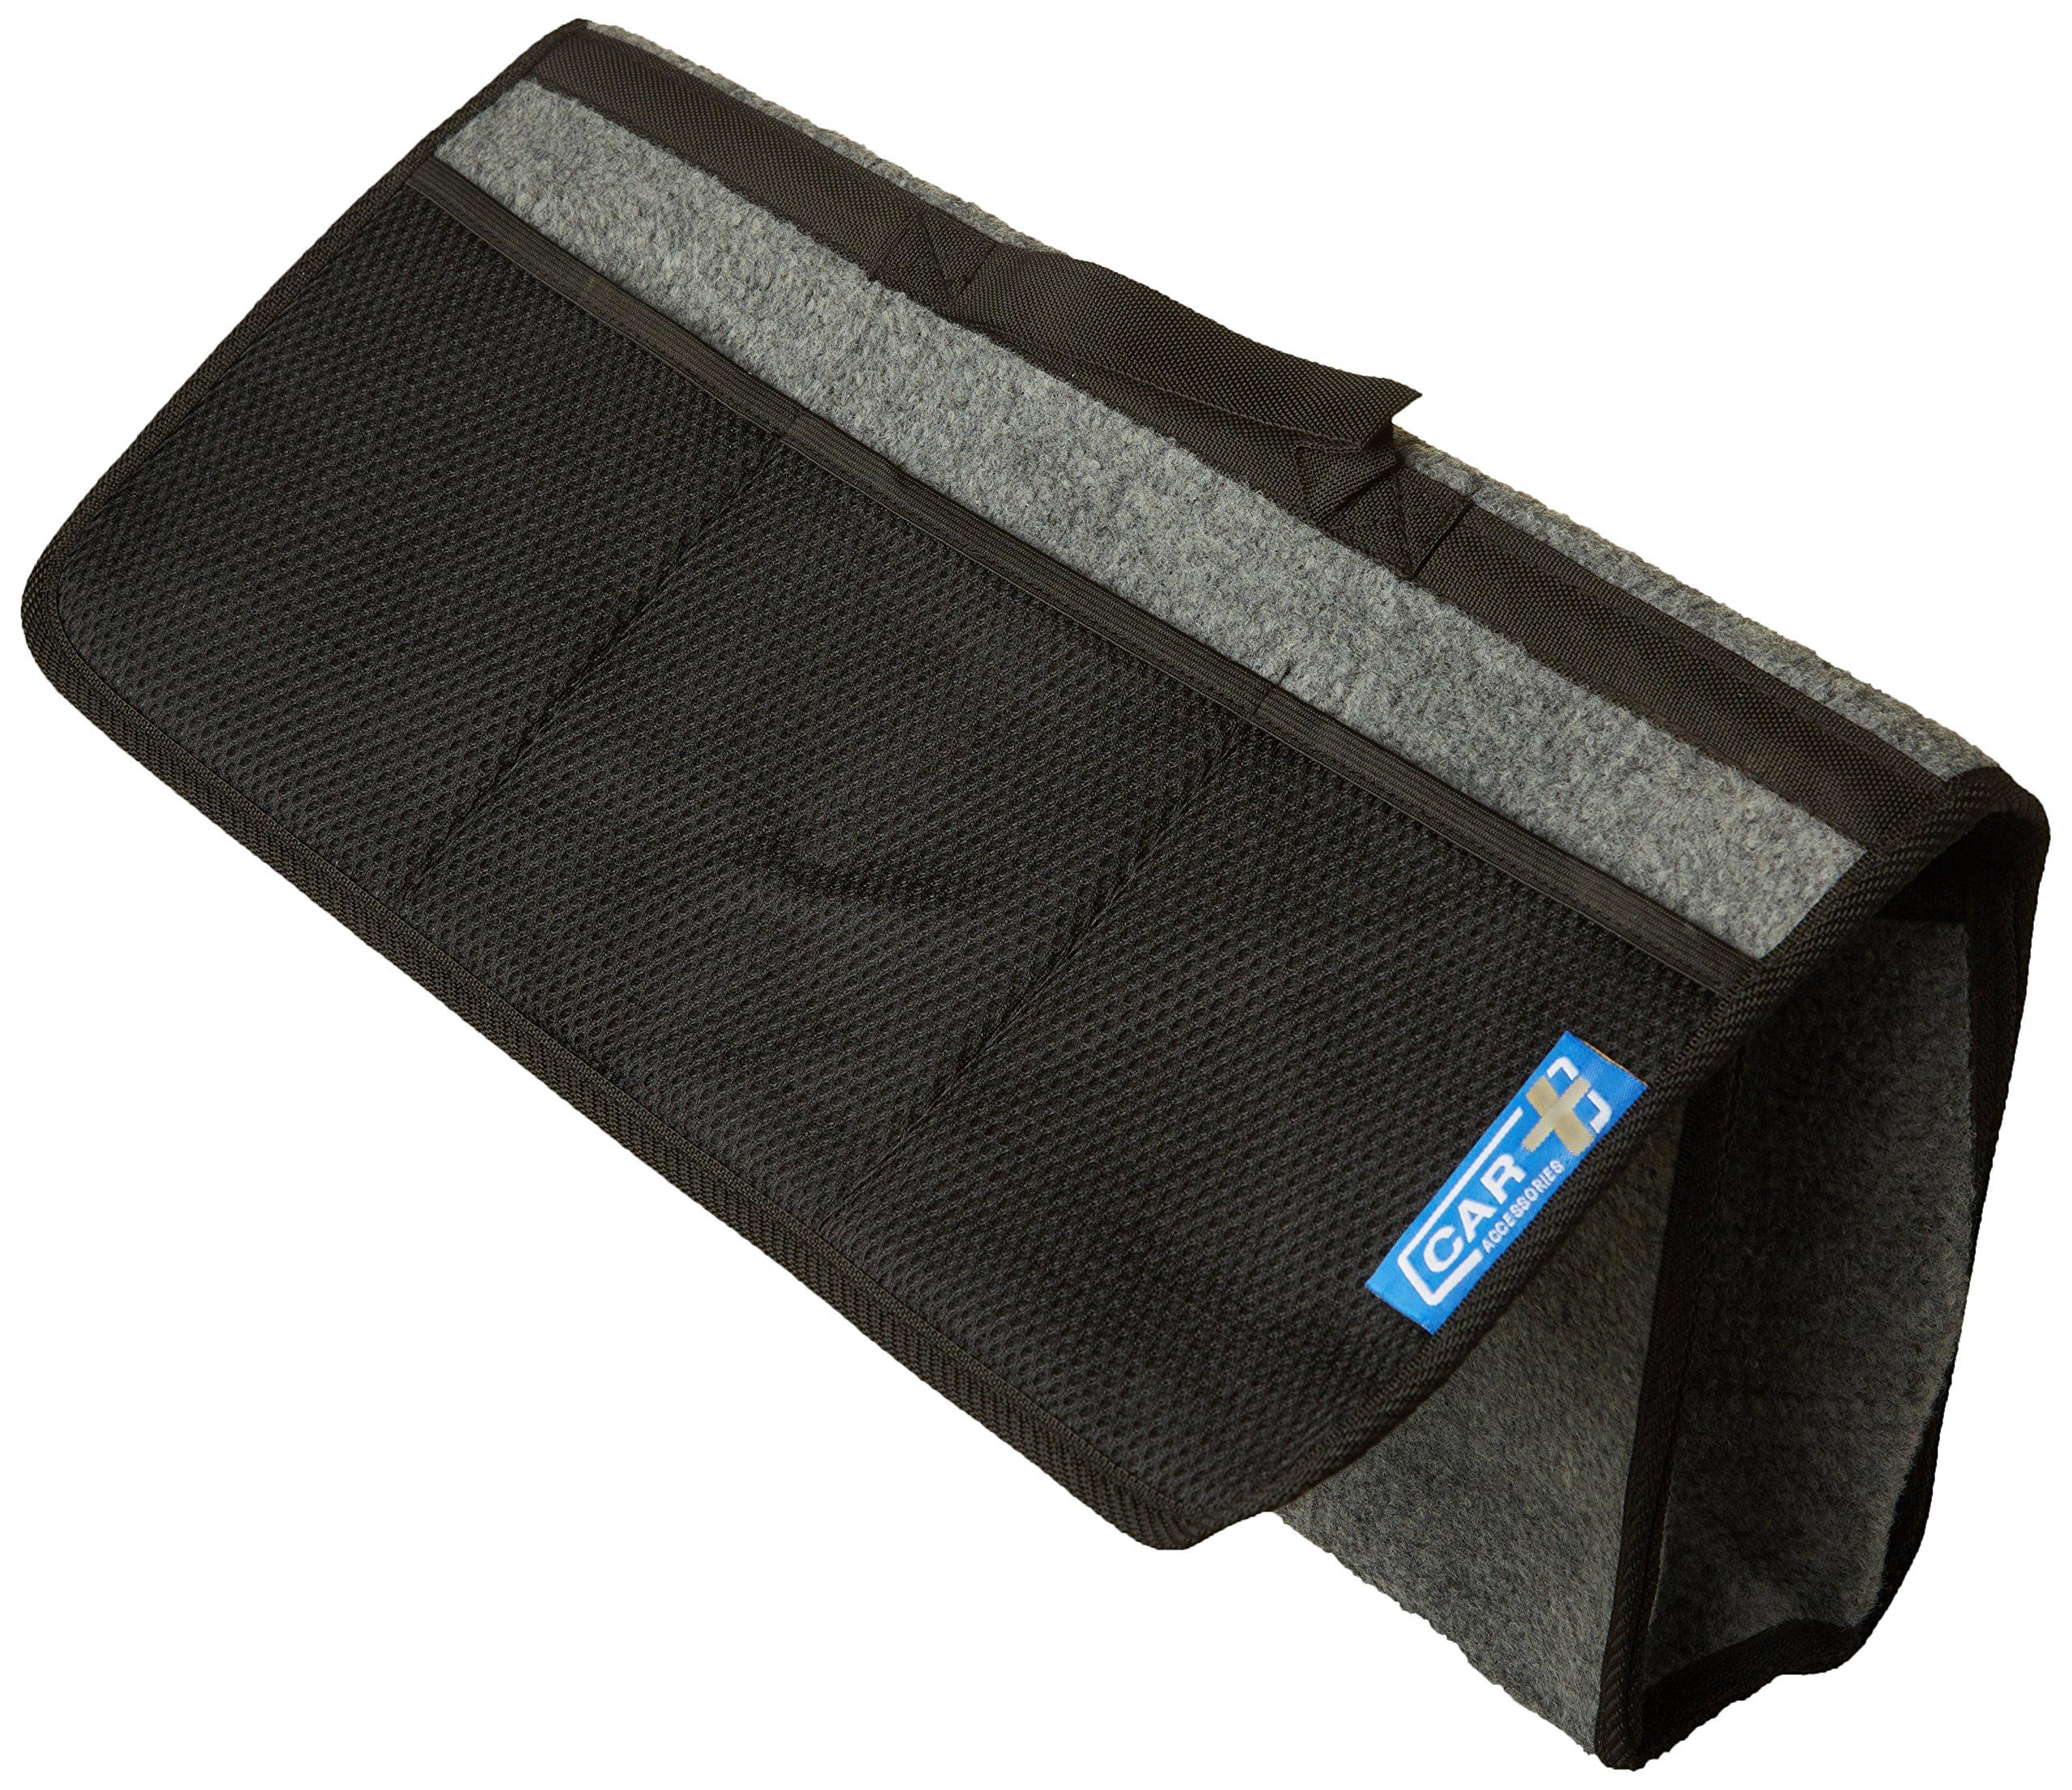 SUMEX 2808032 - Bolsa Maletero 50X25 cm,Boot Tidy 2